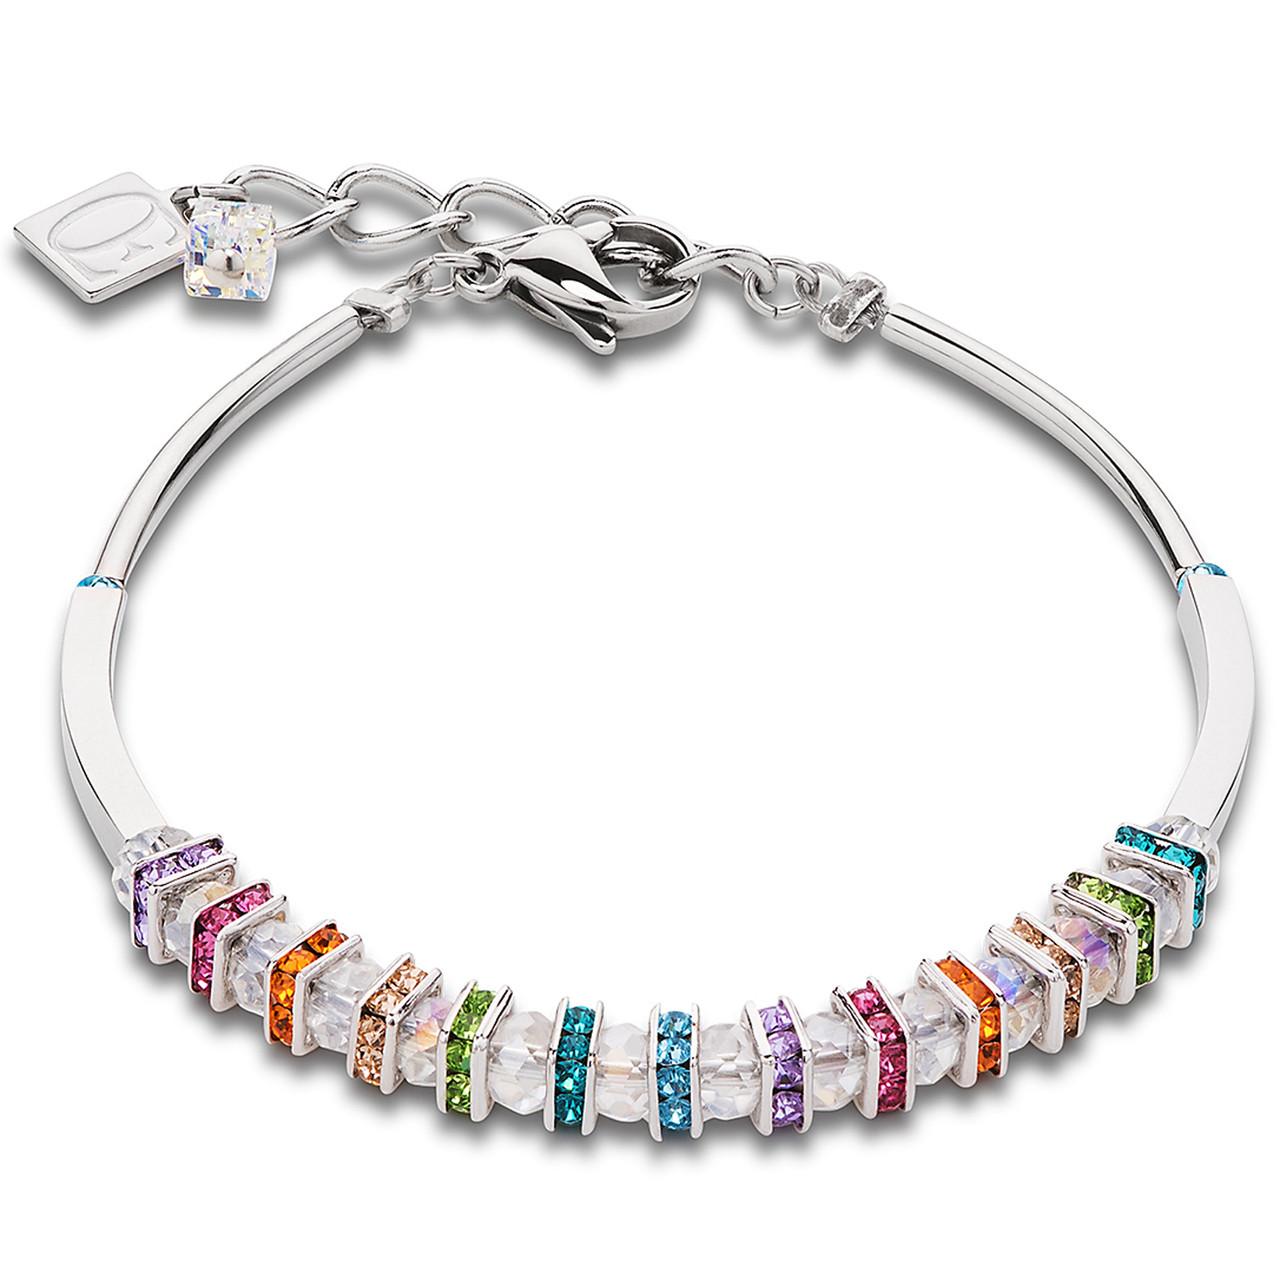 Coeur De Lion Swarovski Crystals & Cut Glass Multi Coloured Bracelet  4858-30-1518